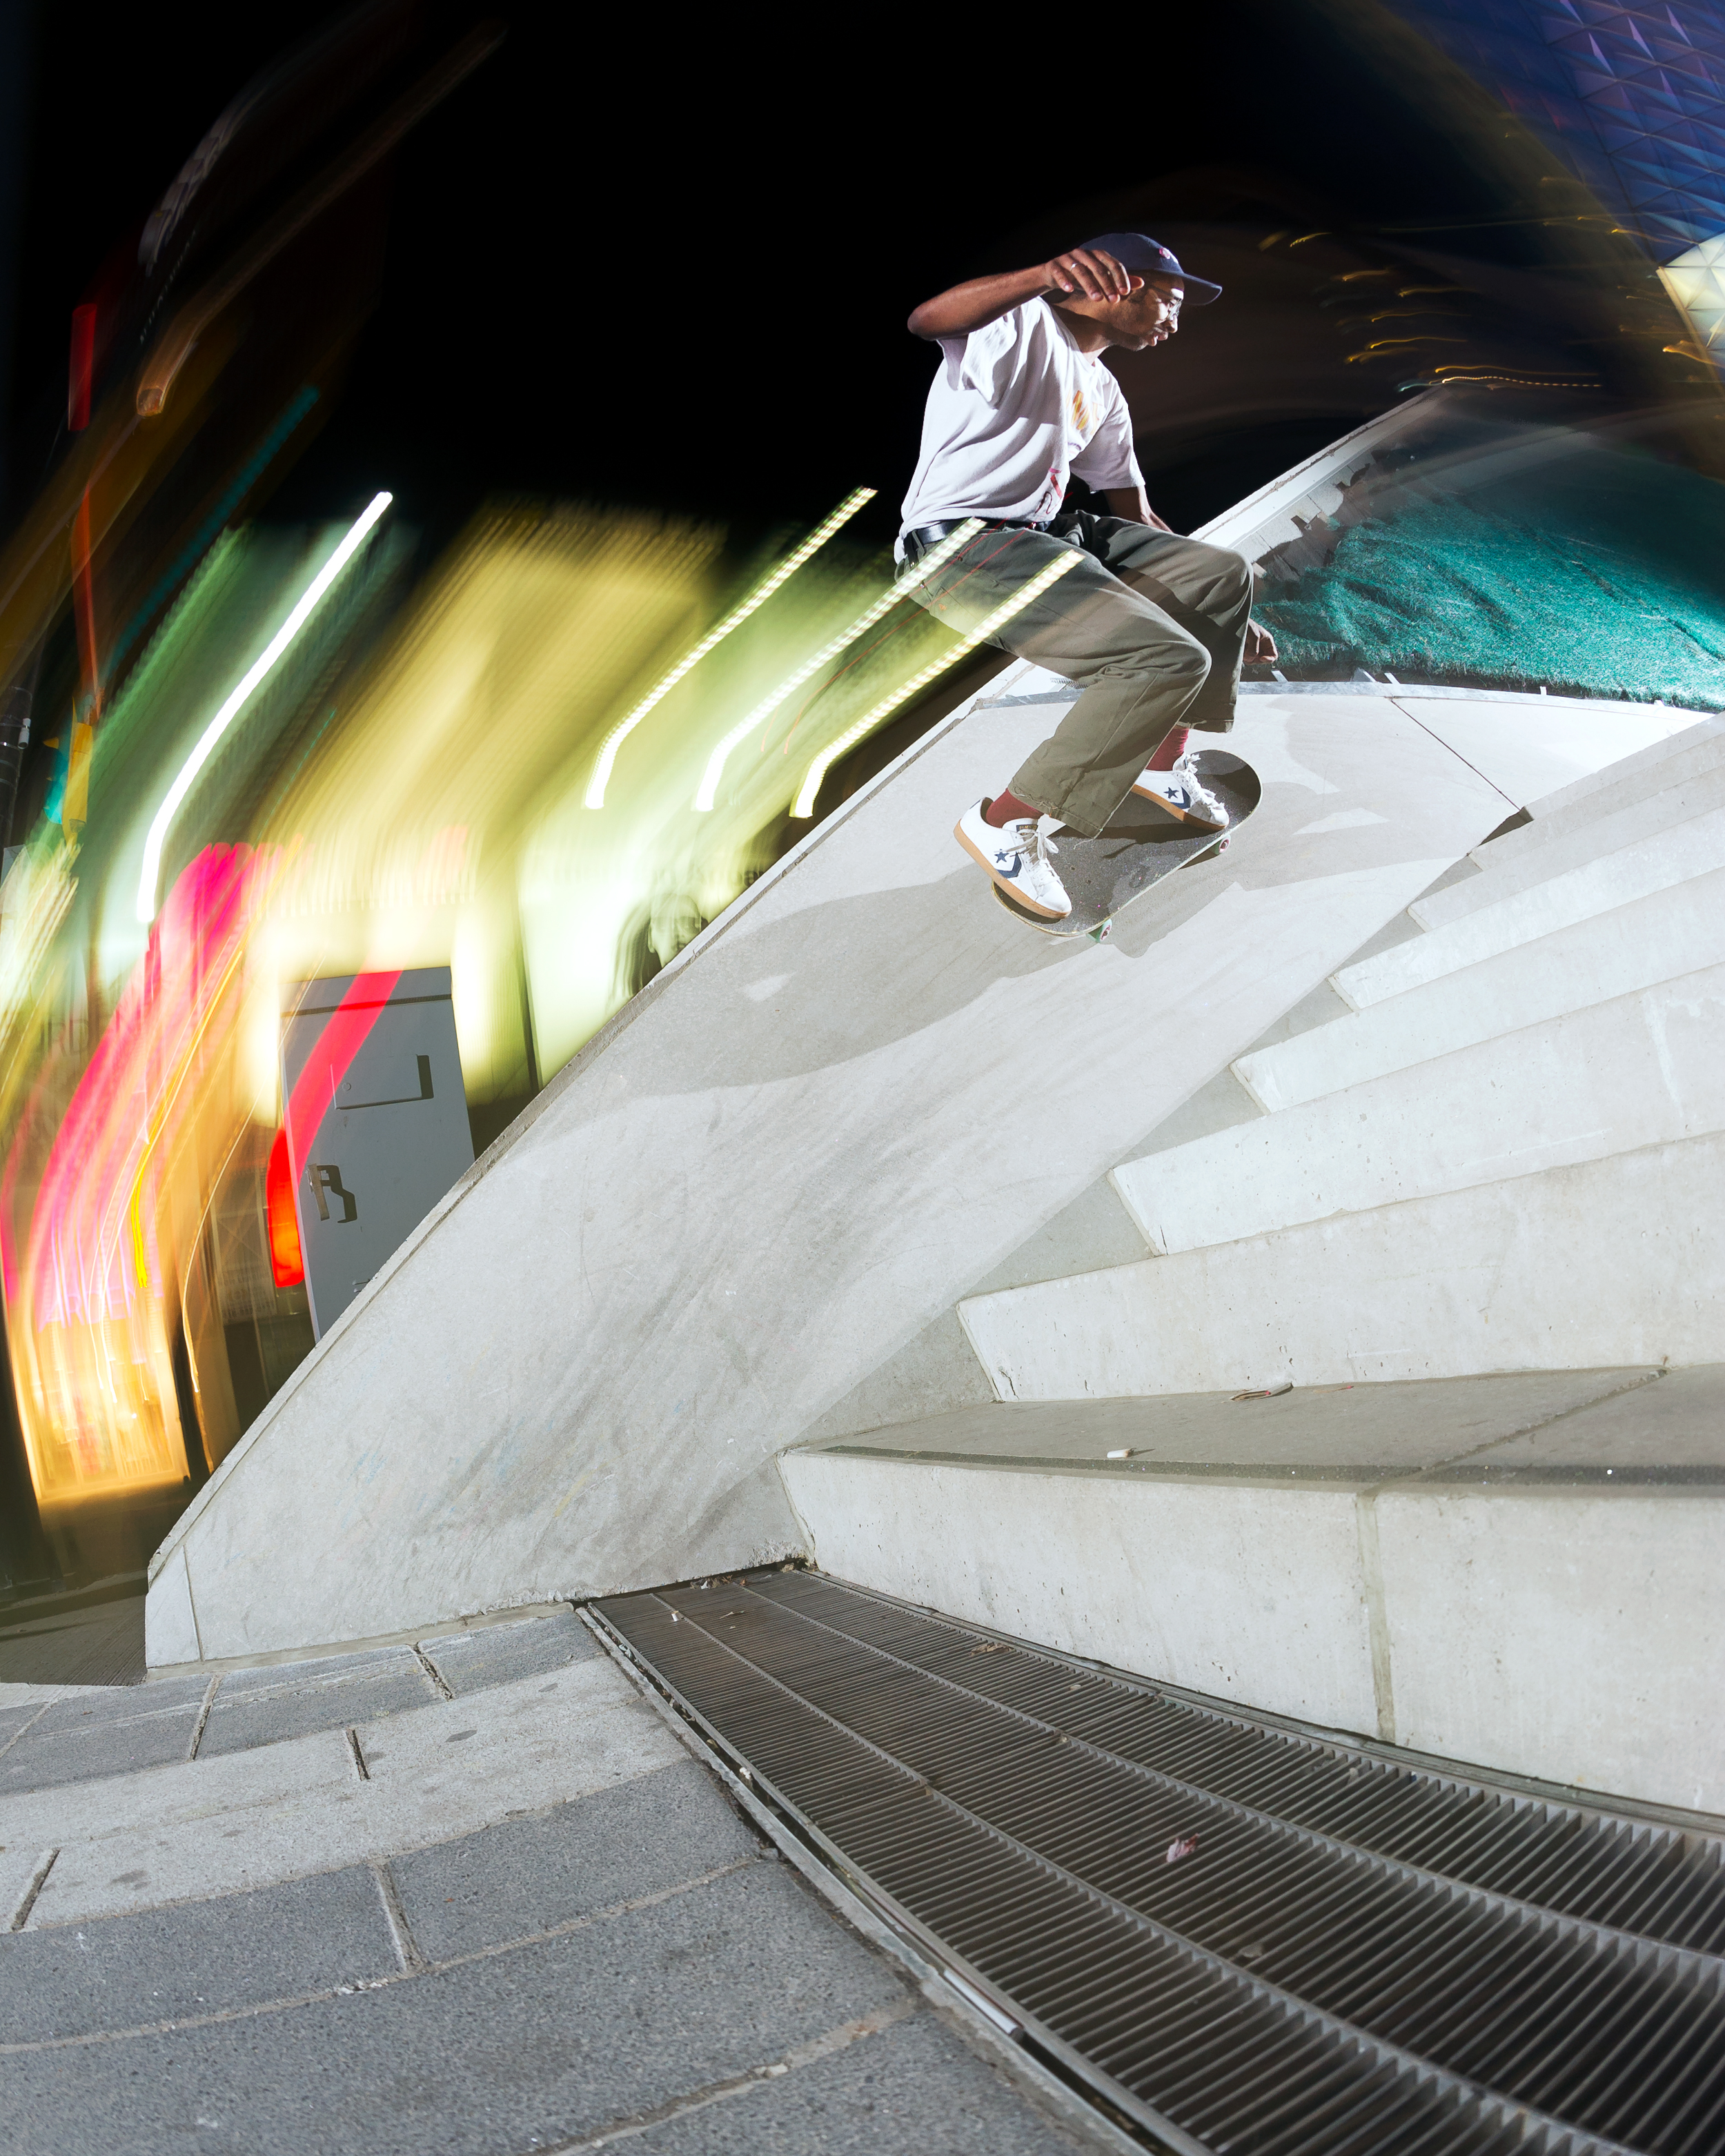 NTITRT_08_JamesMorleyPhoto.jpg